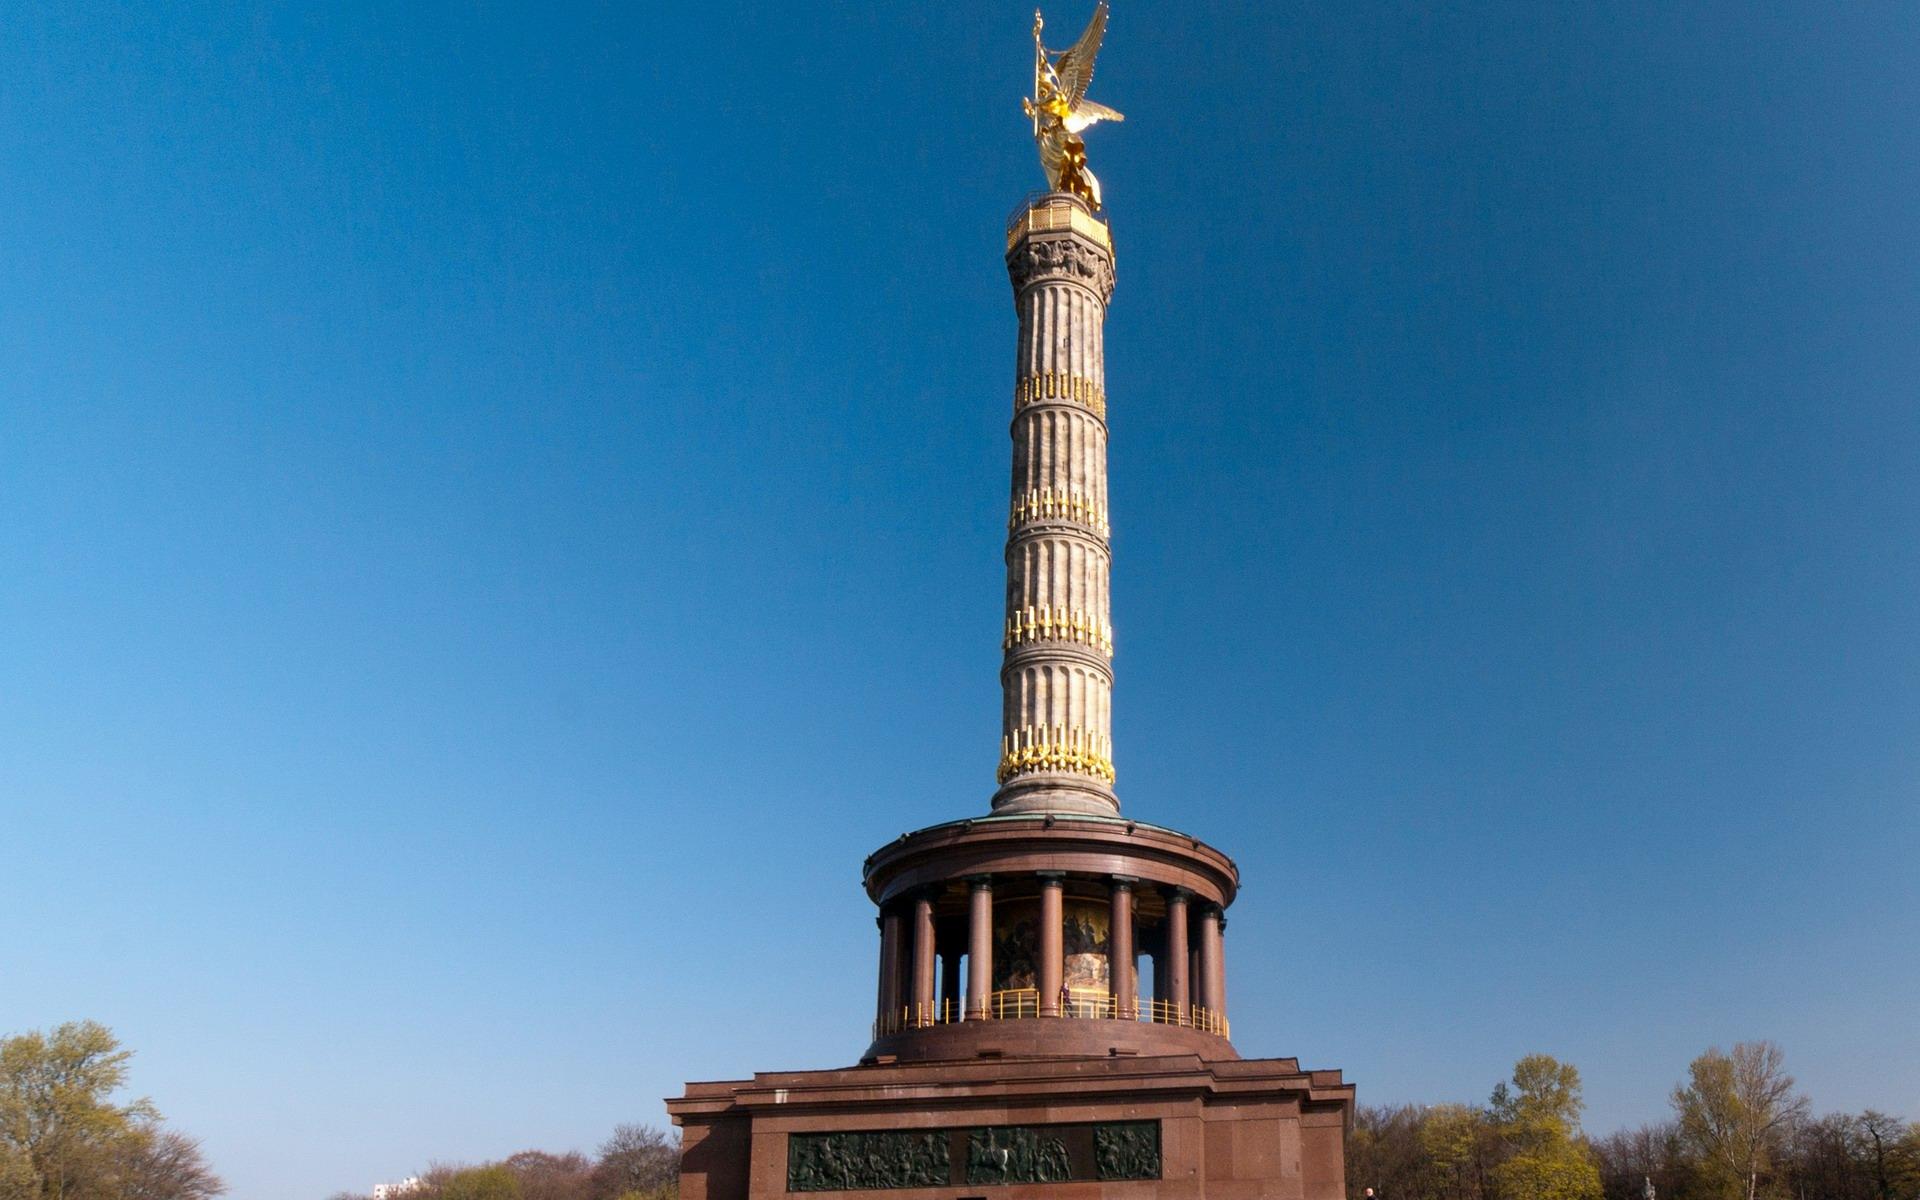 Berlin Victory Column photos, wallpapers